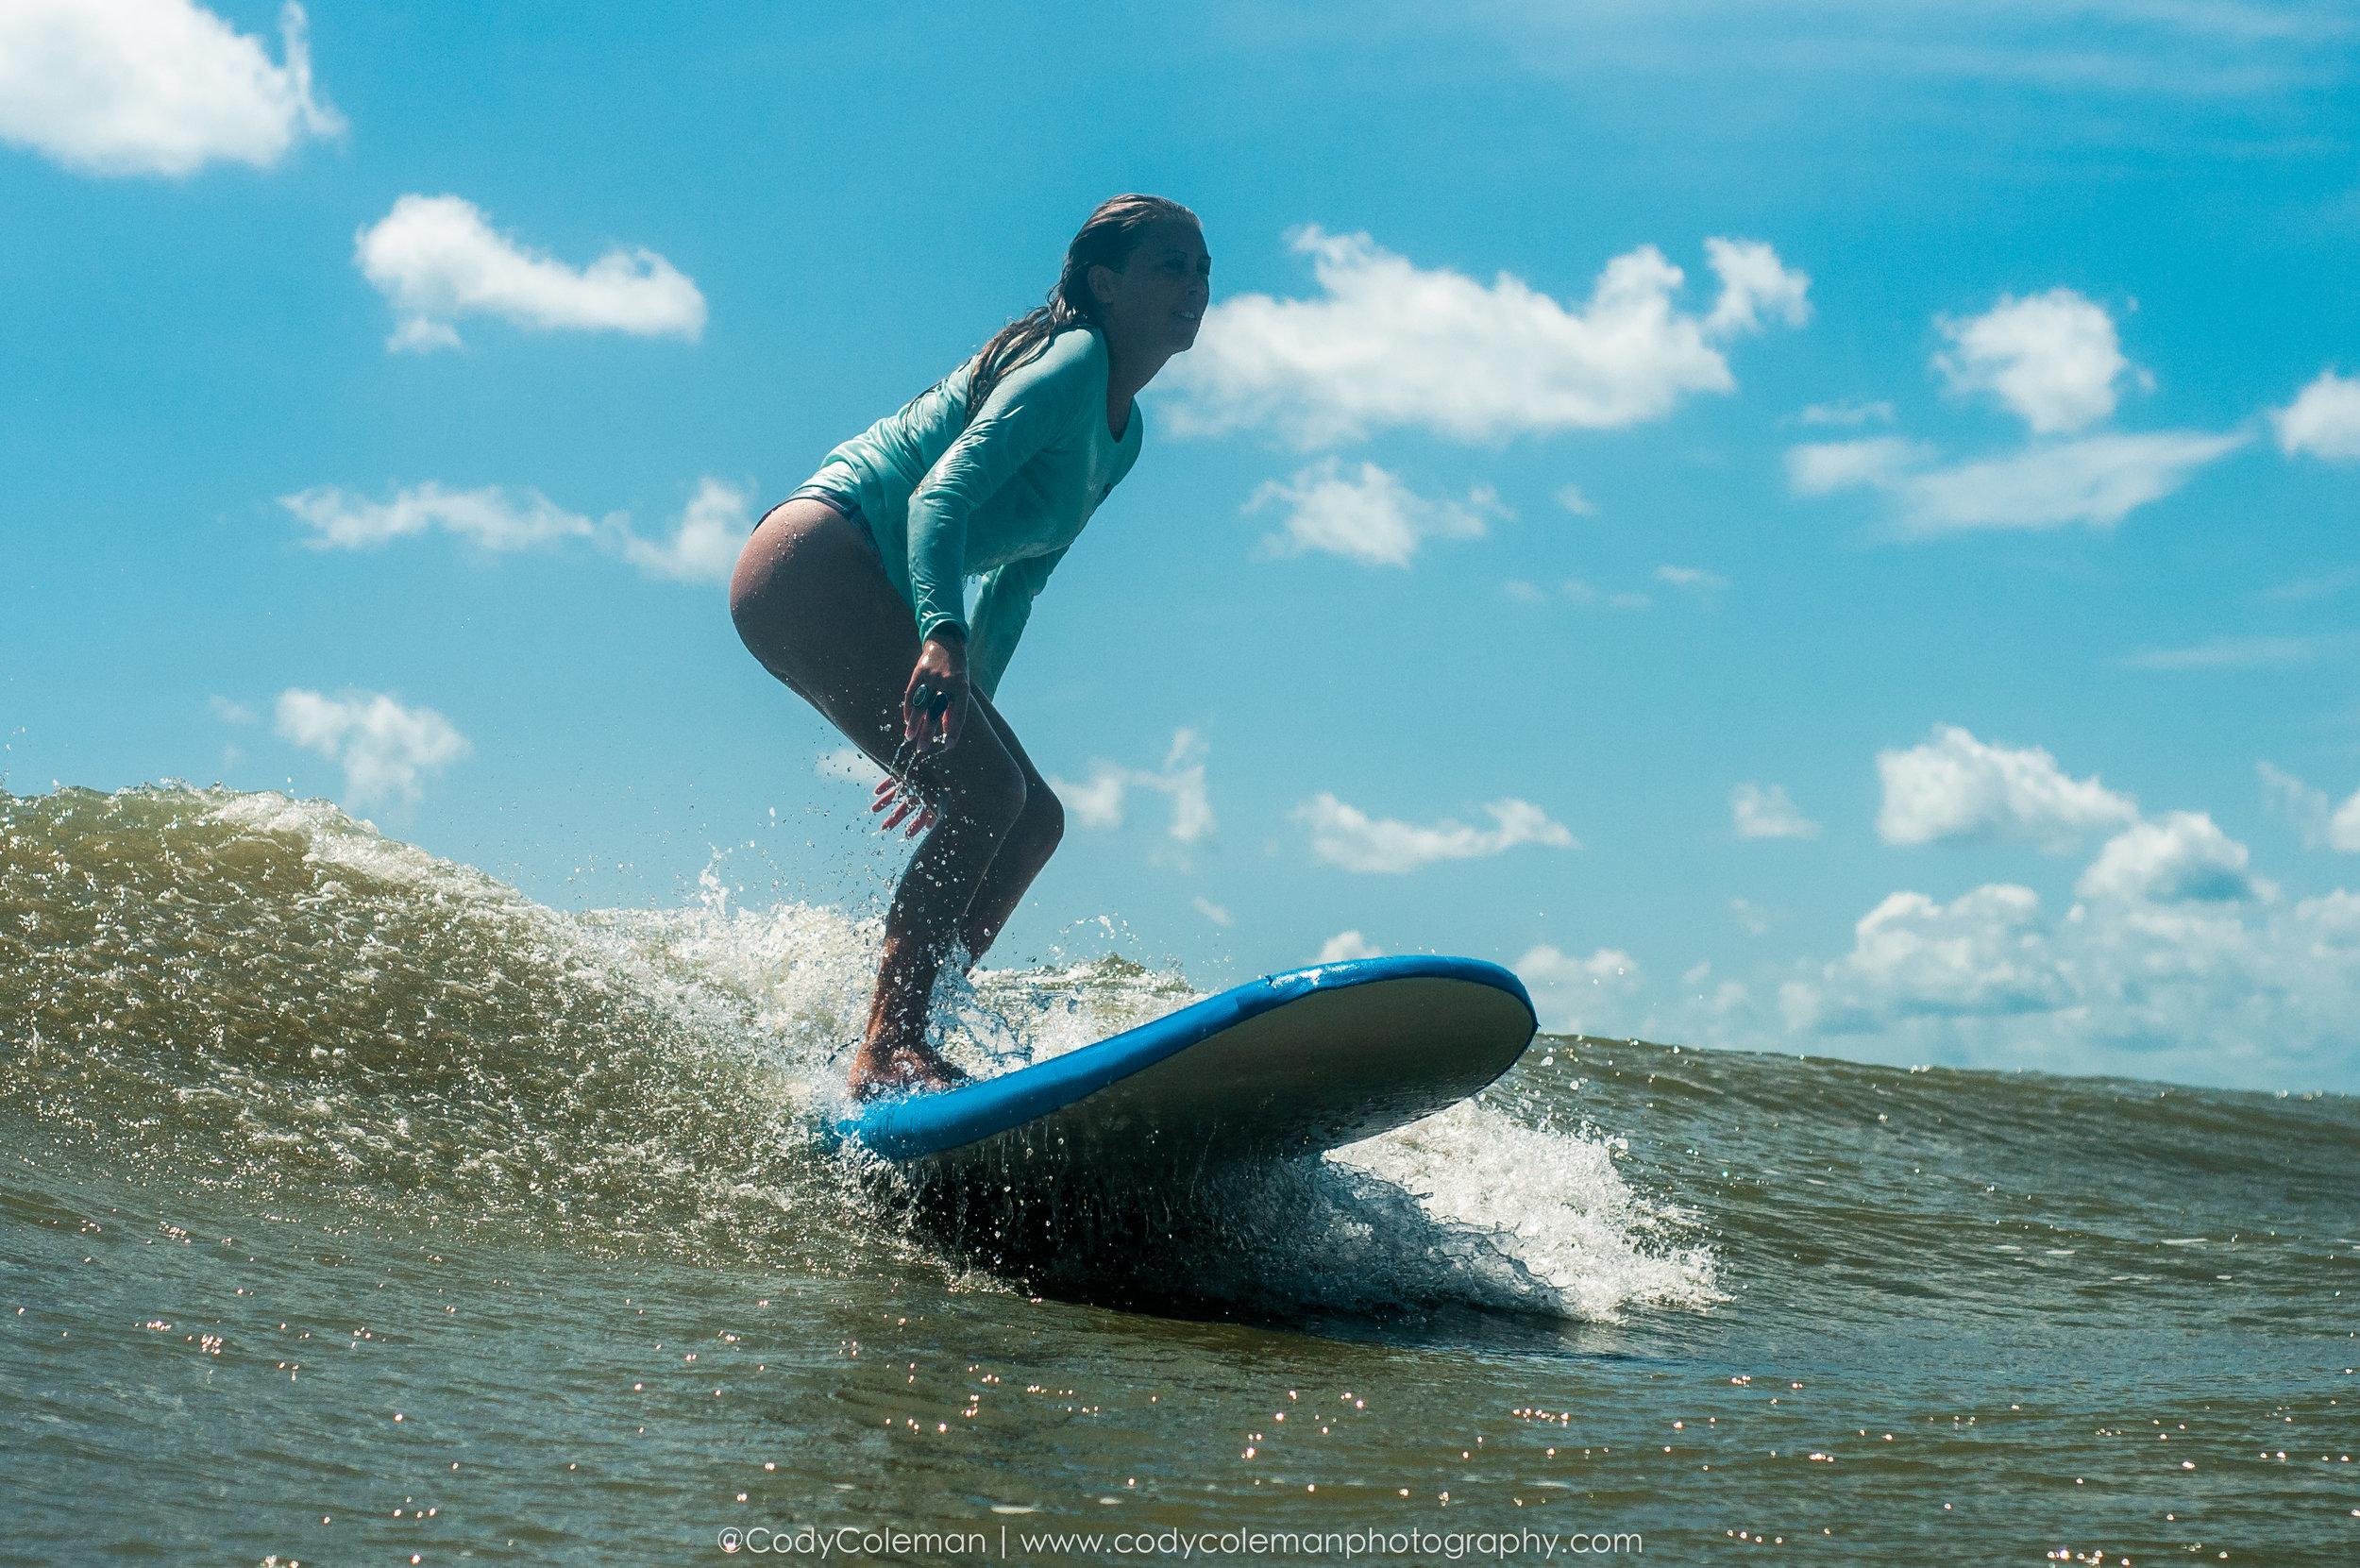 Motherday_SurfCamp_PHOTO_COLEMAN-365.jpg